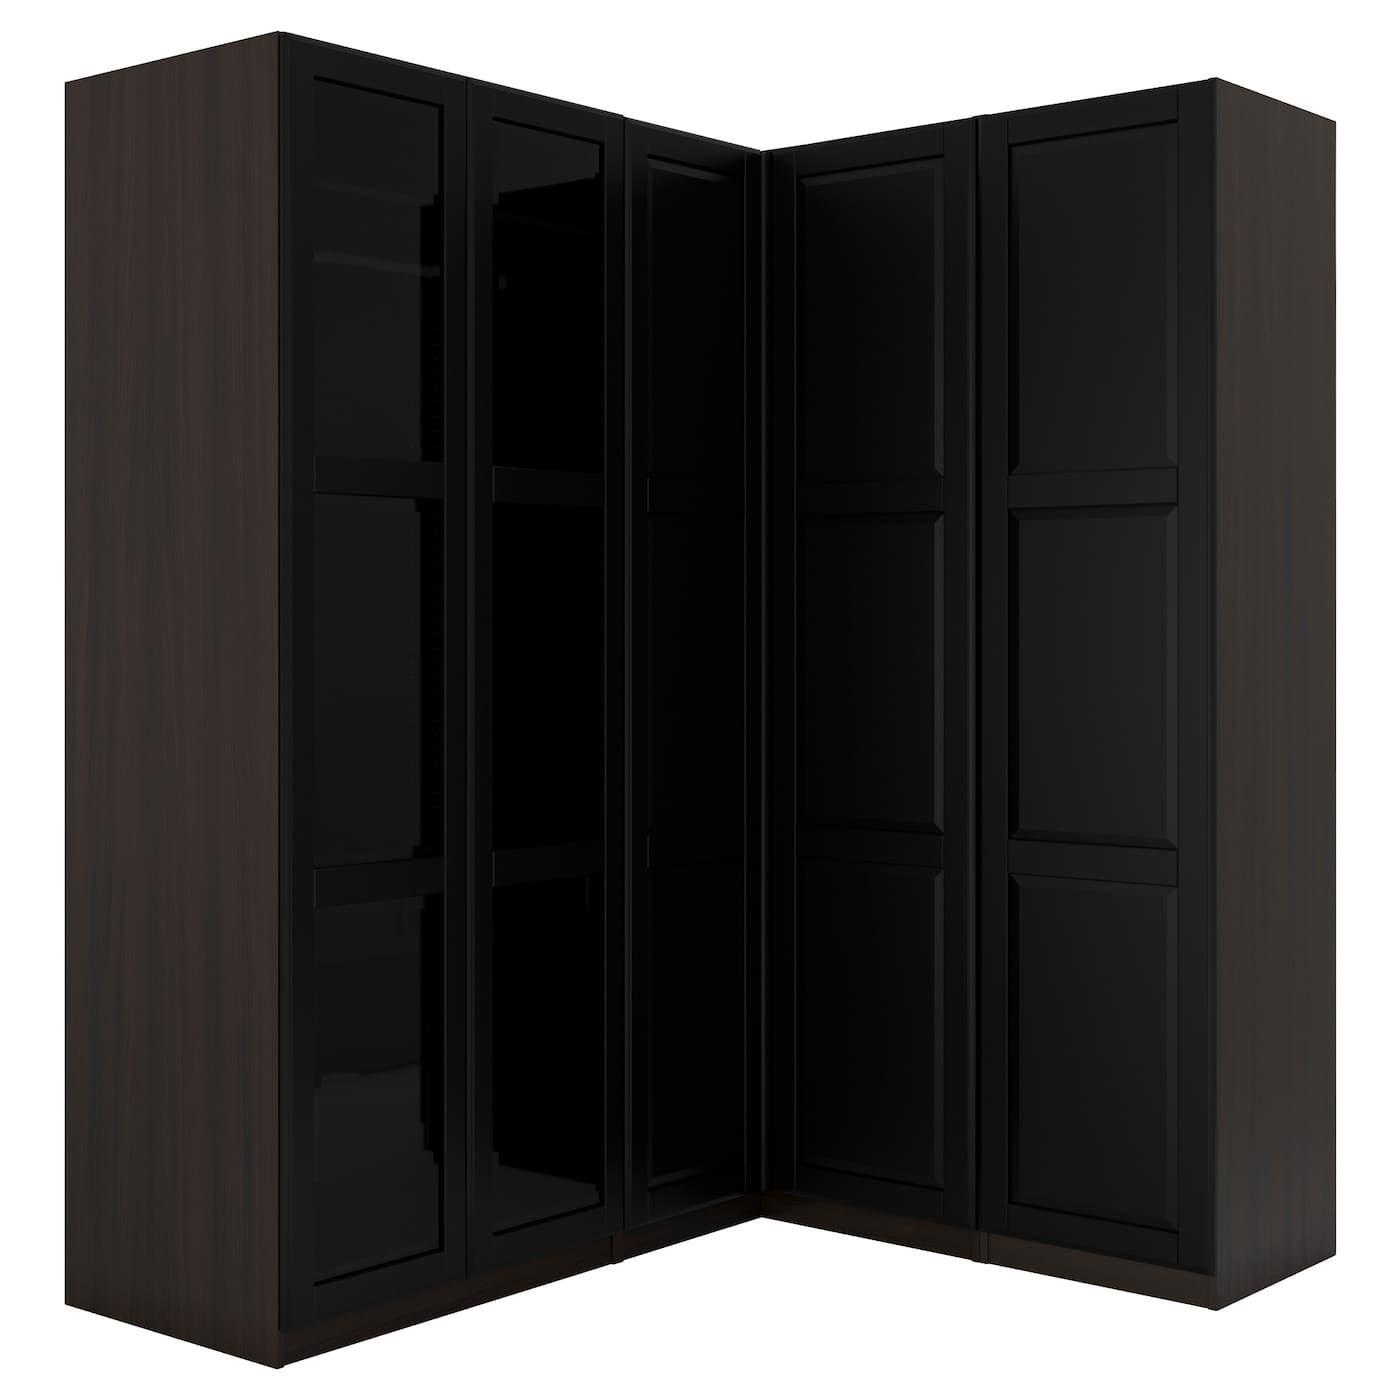 IKEA PAX blackbrown Corner wardrobe Frame colour